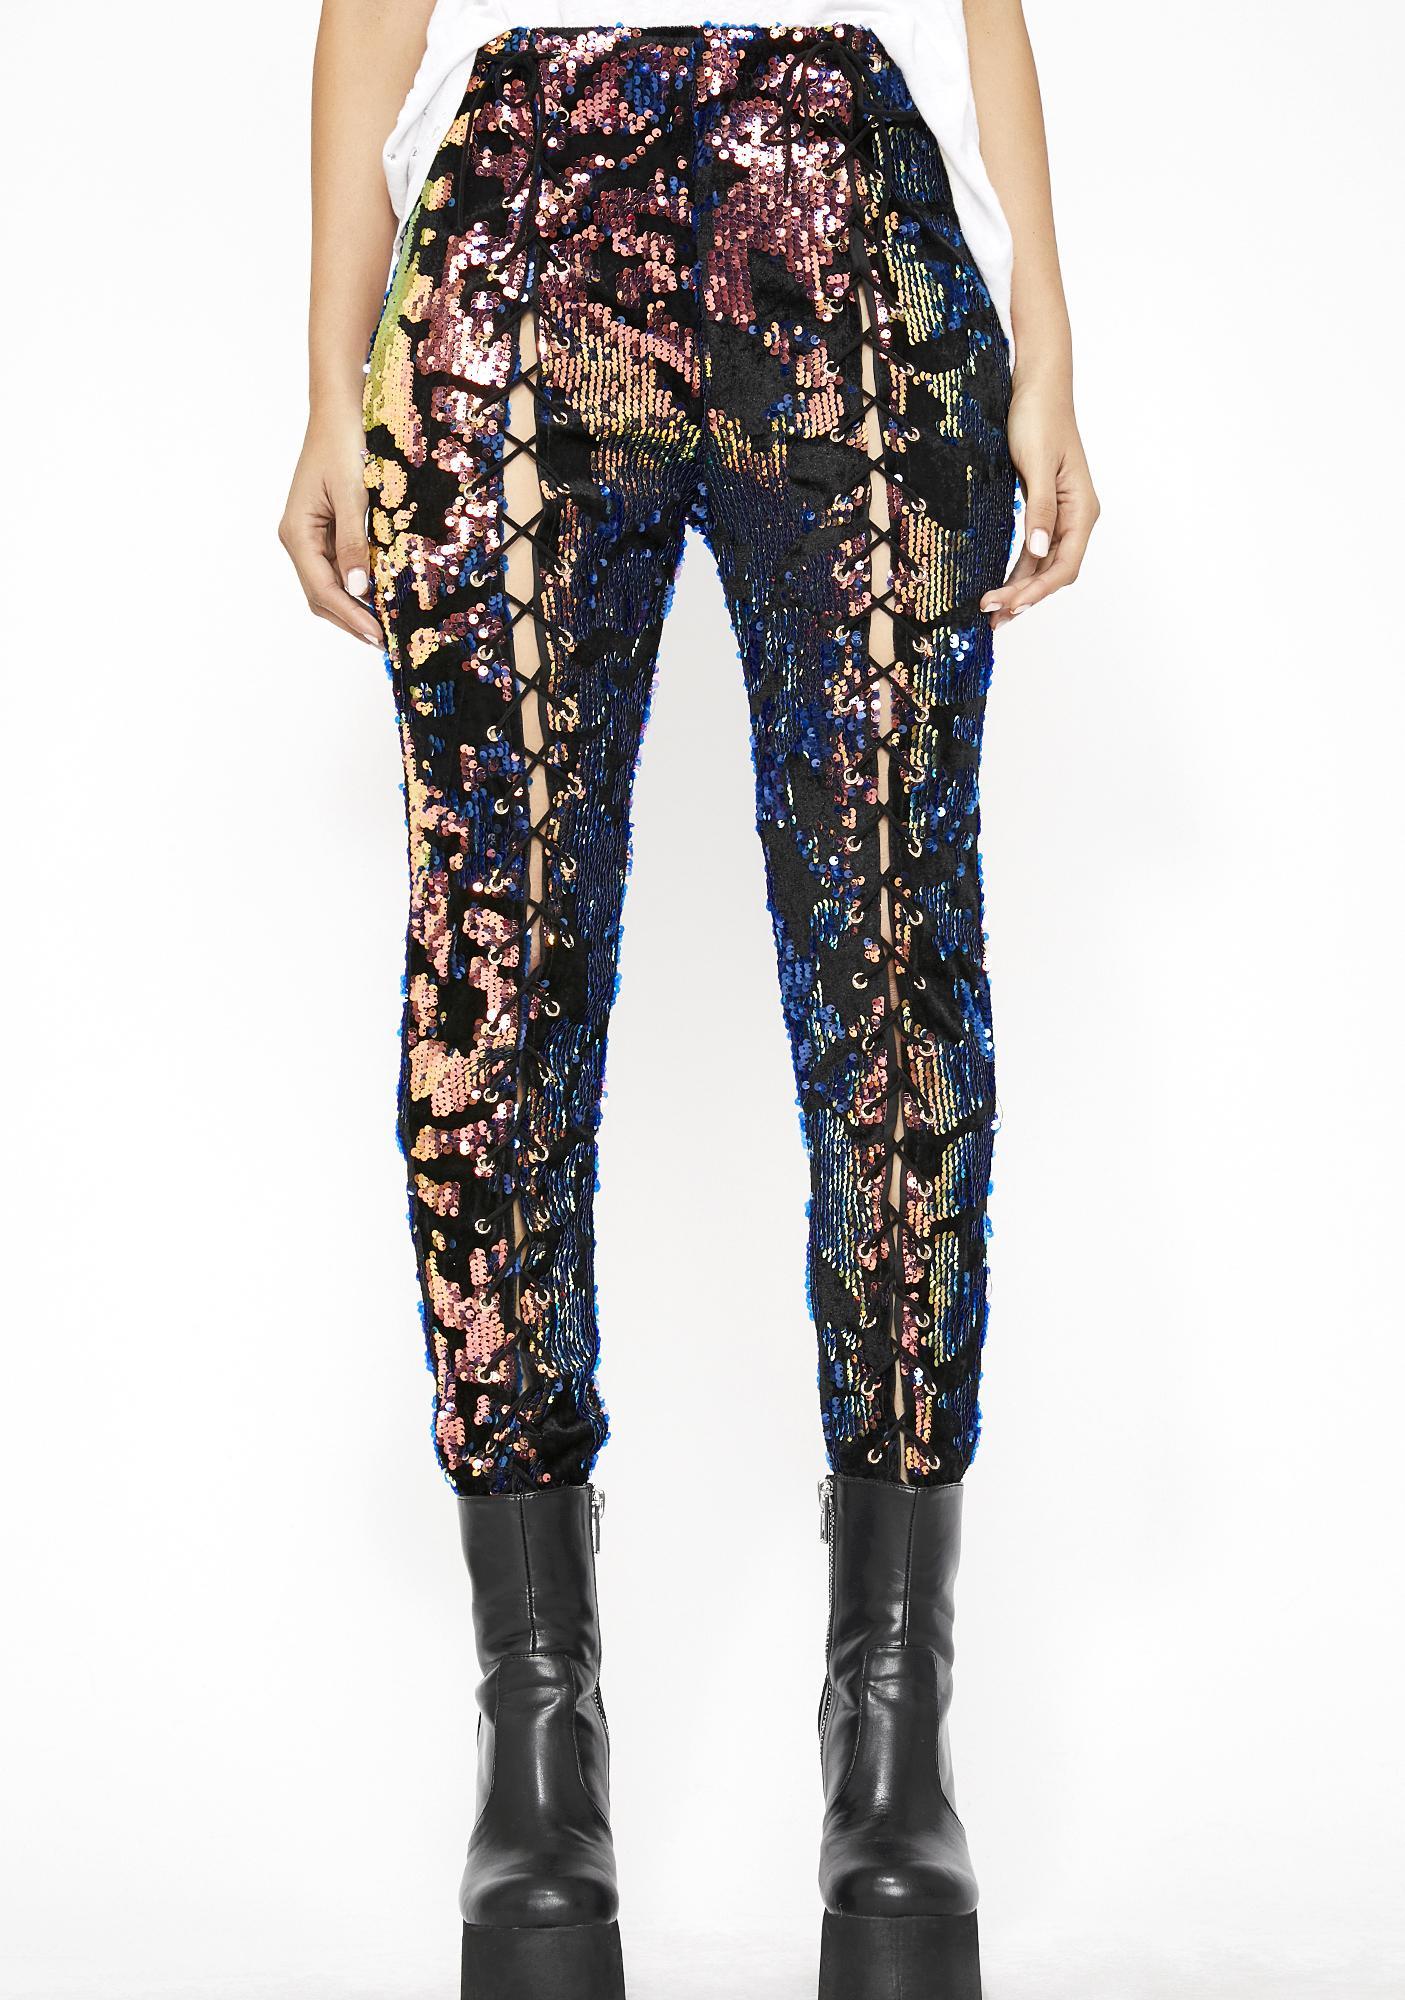 Feelin' Flashy Lace Up Pants